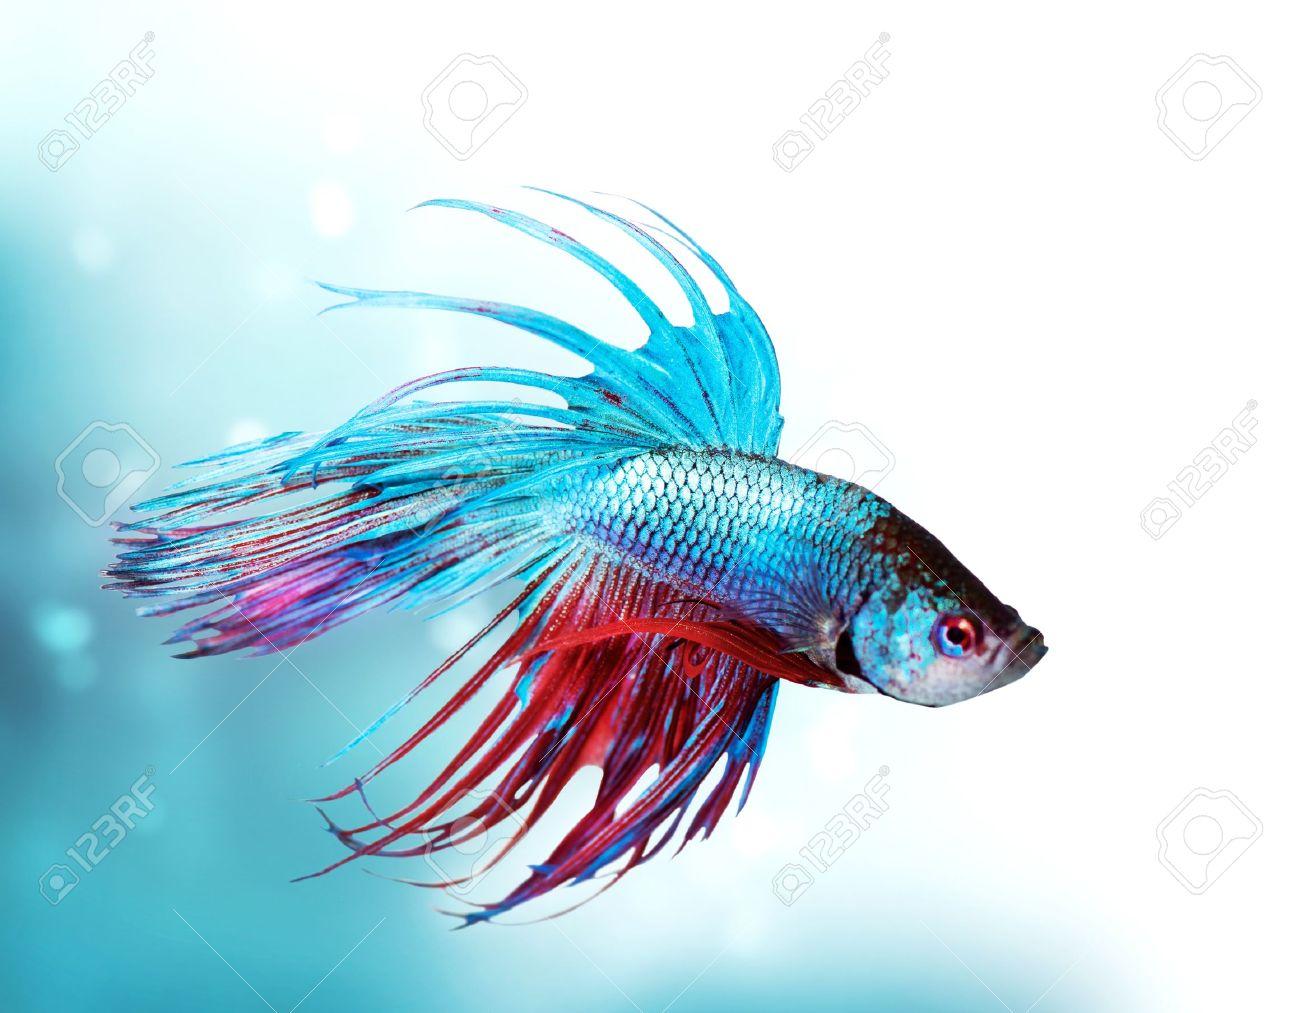 Colorful Betta Fish closeup  Dragon Fish  Aquarium Stock Photo - 15772431